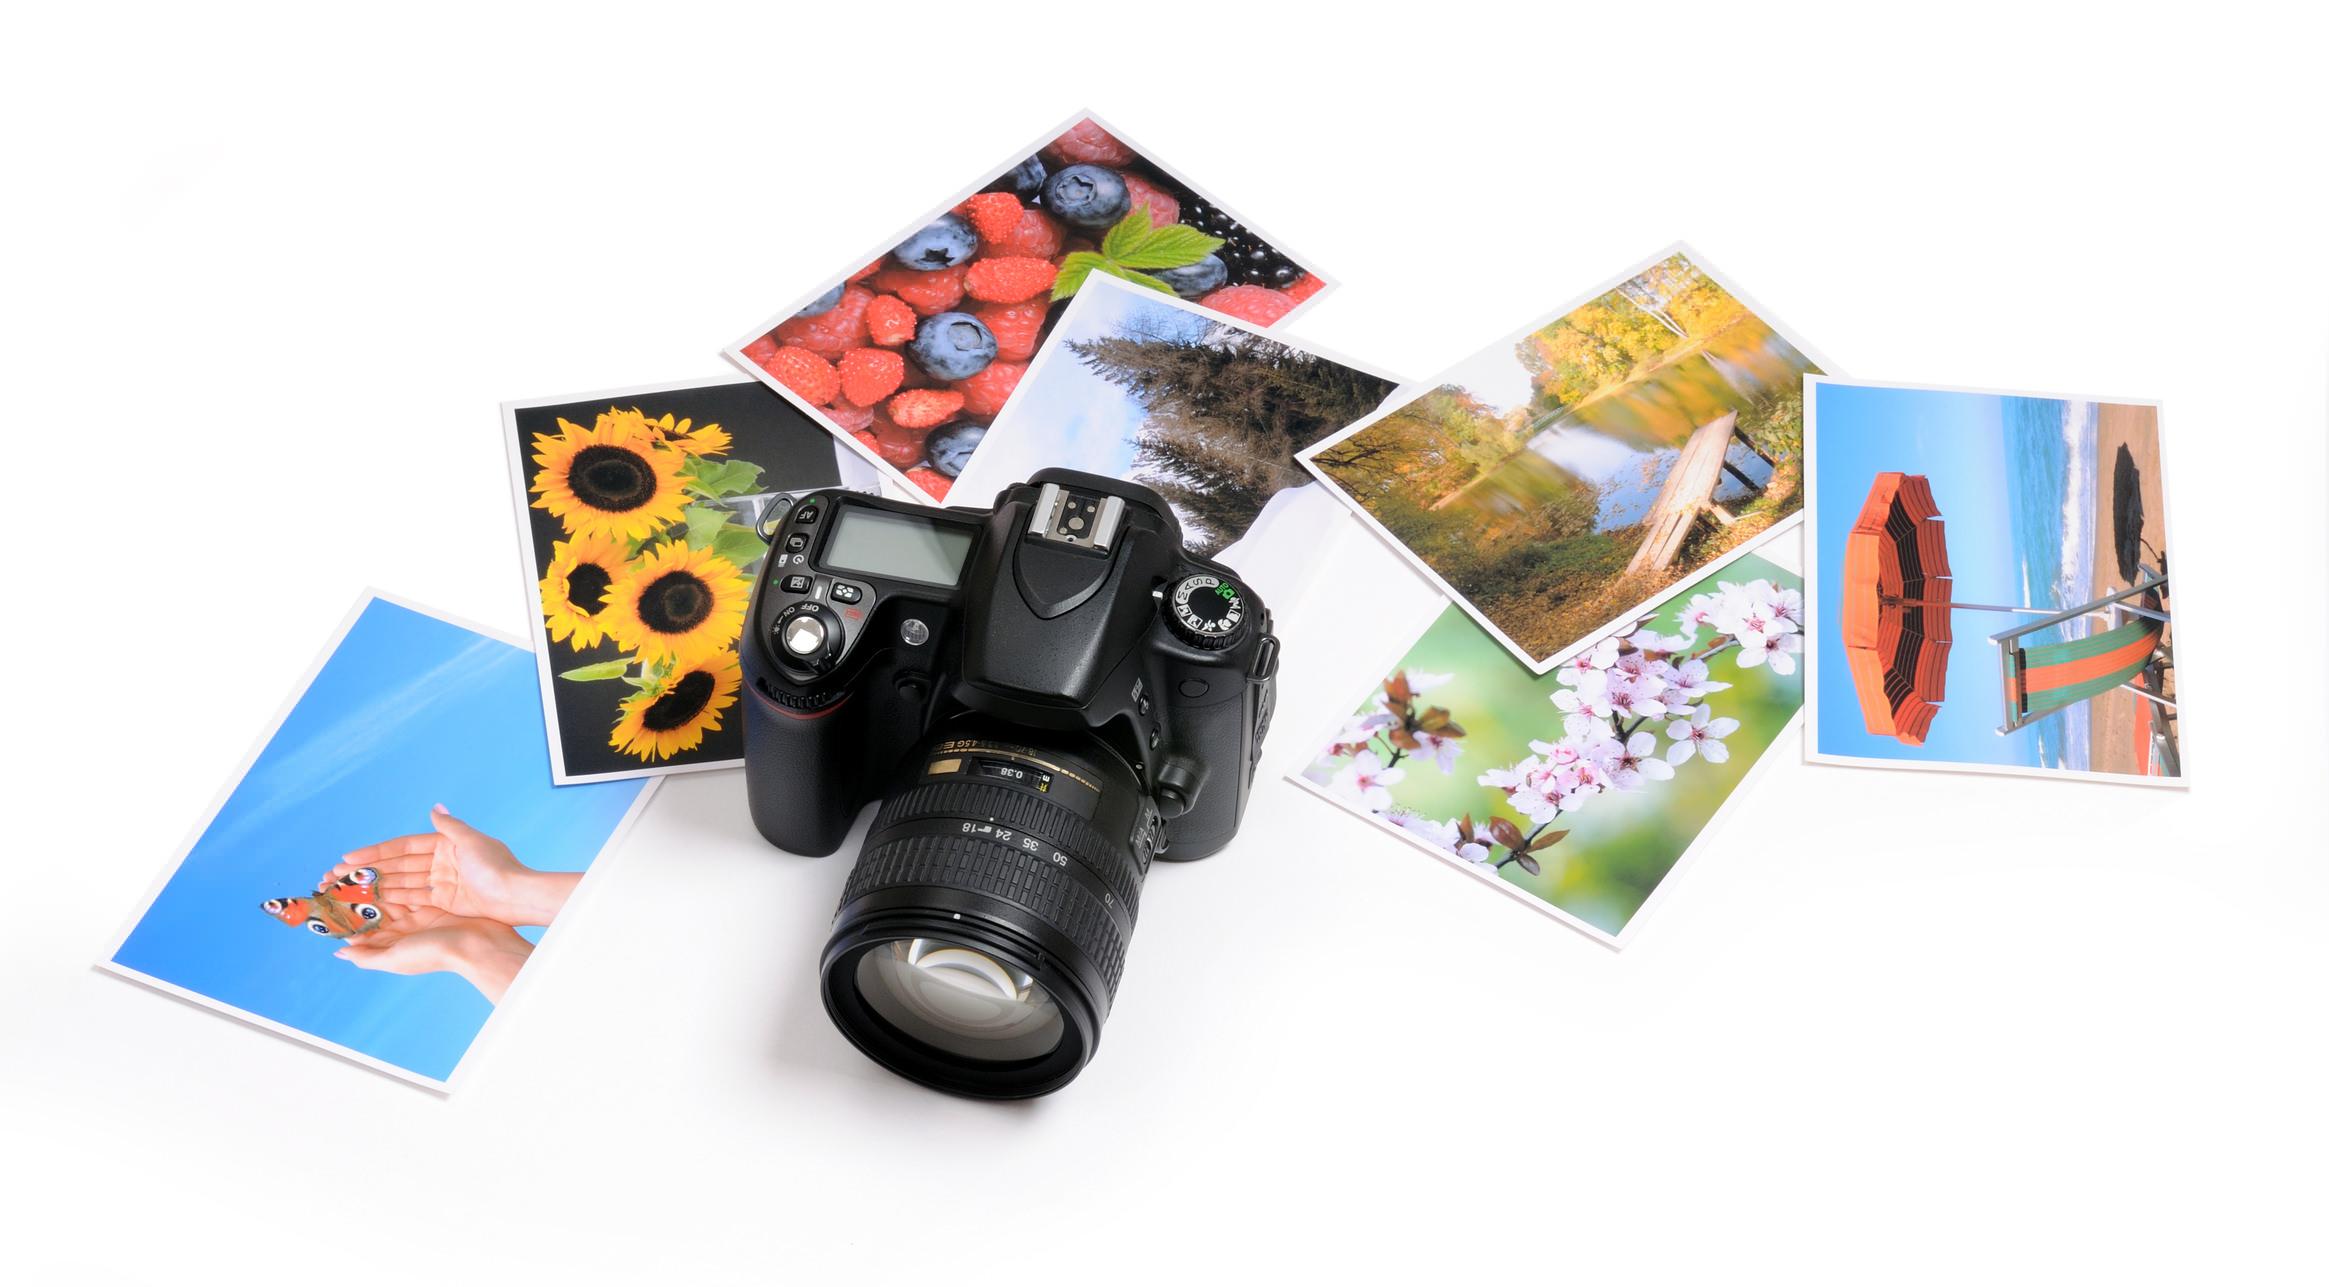 iStock-94978933.jpg image